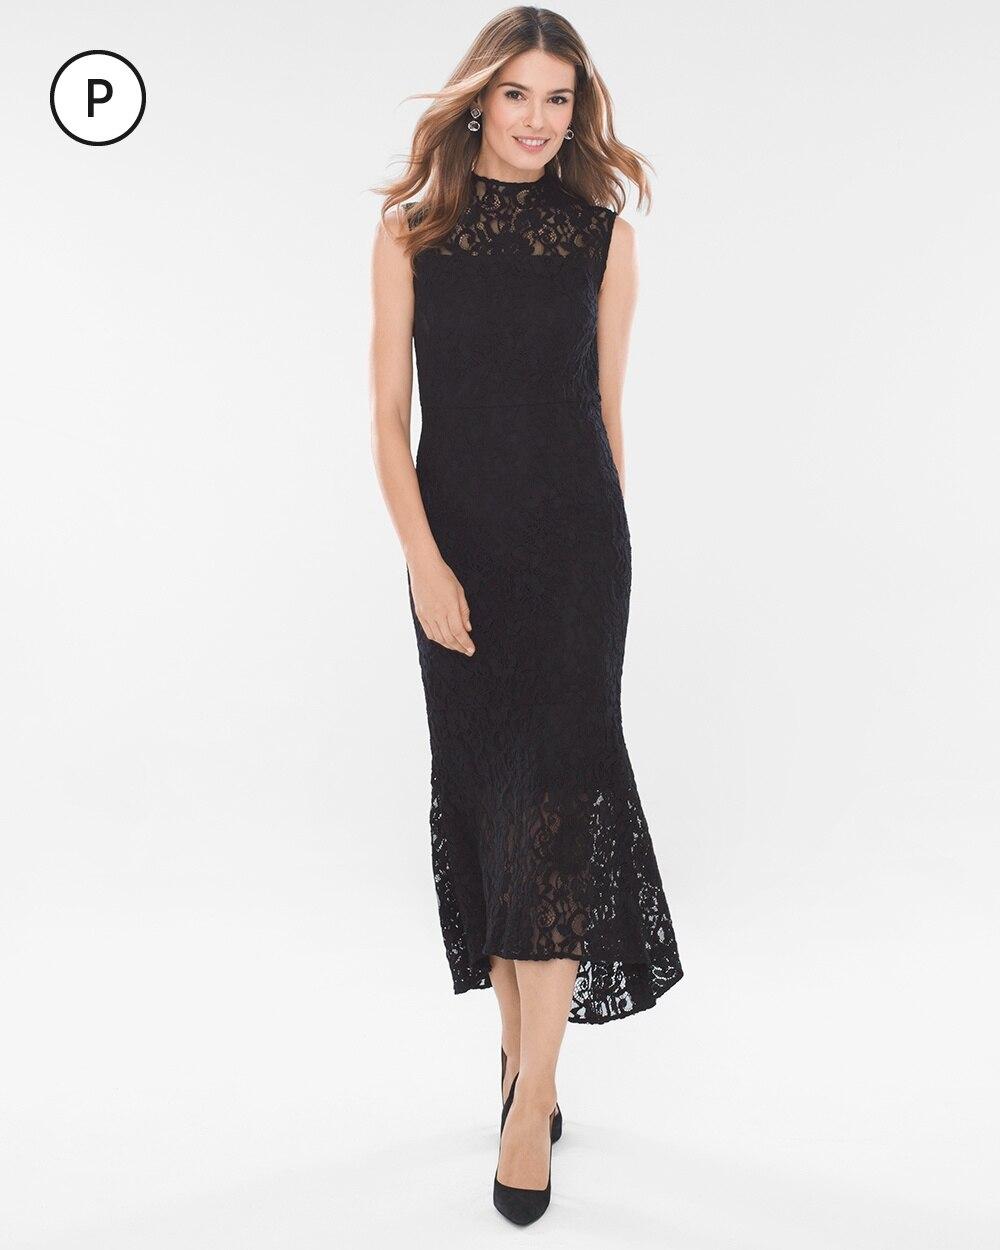 Petite Lace Midi Dress